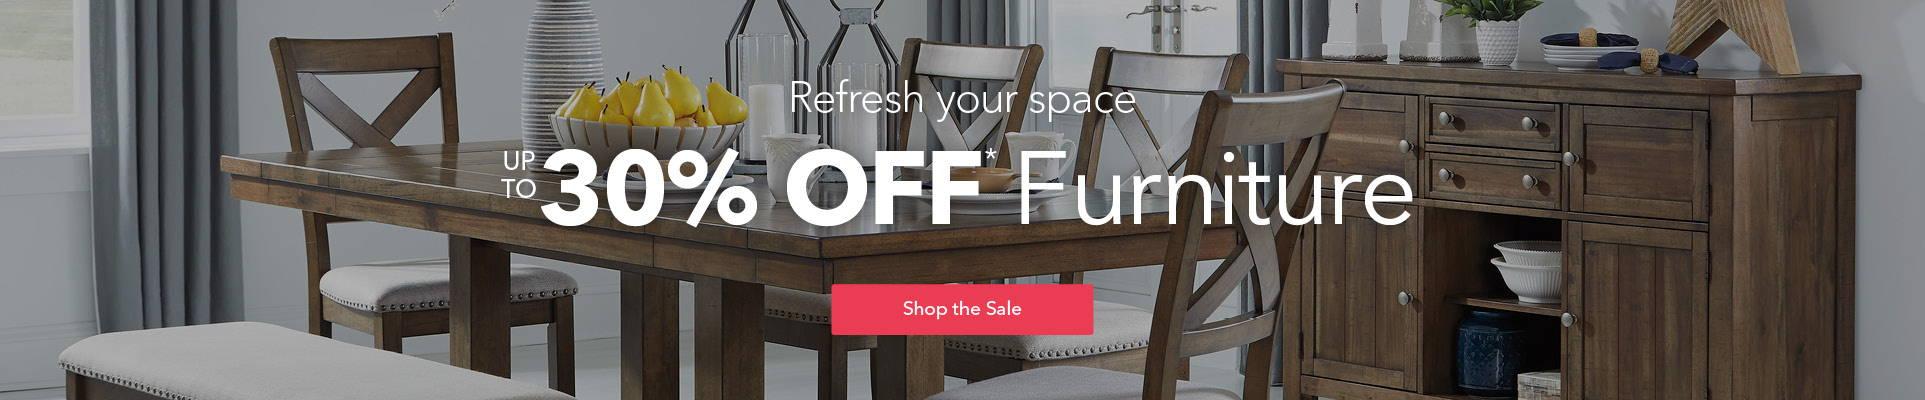 Image of furniture sale banner